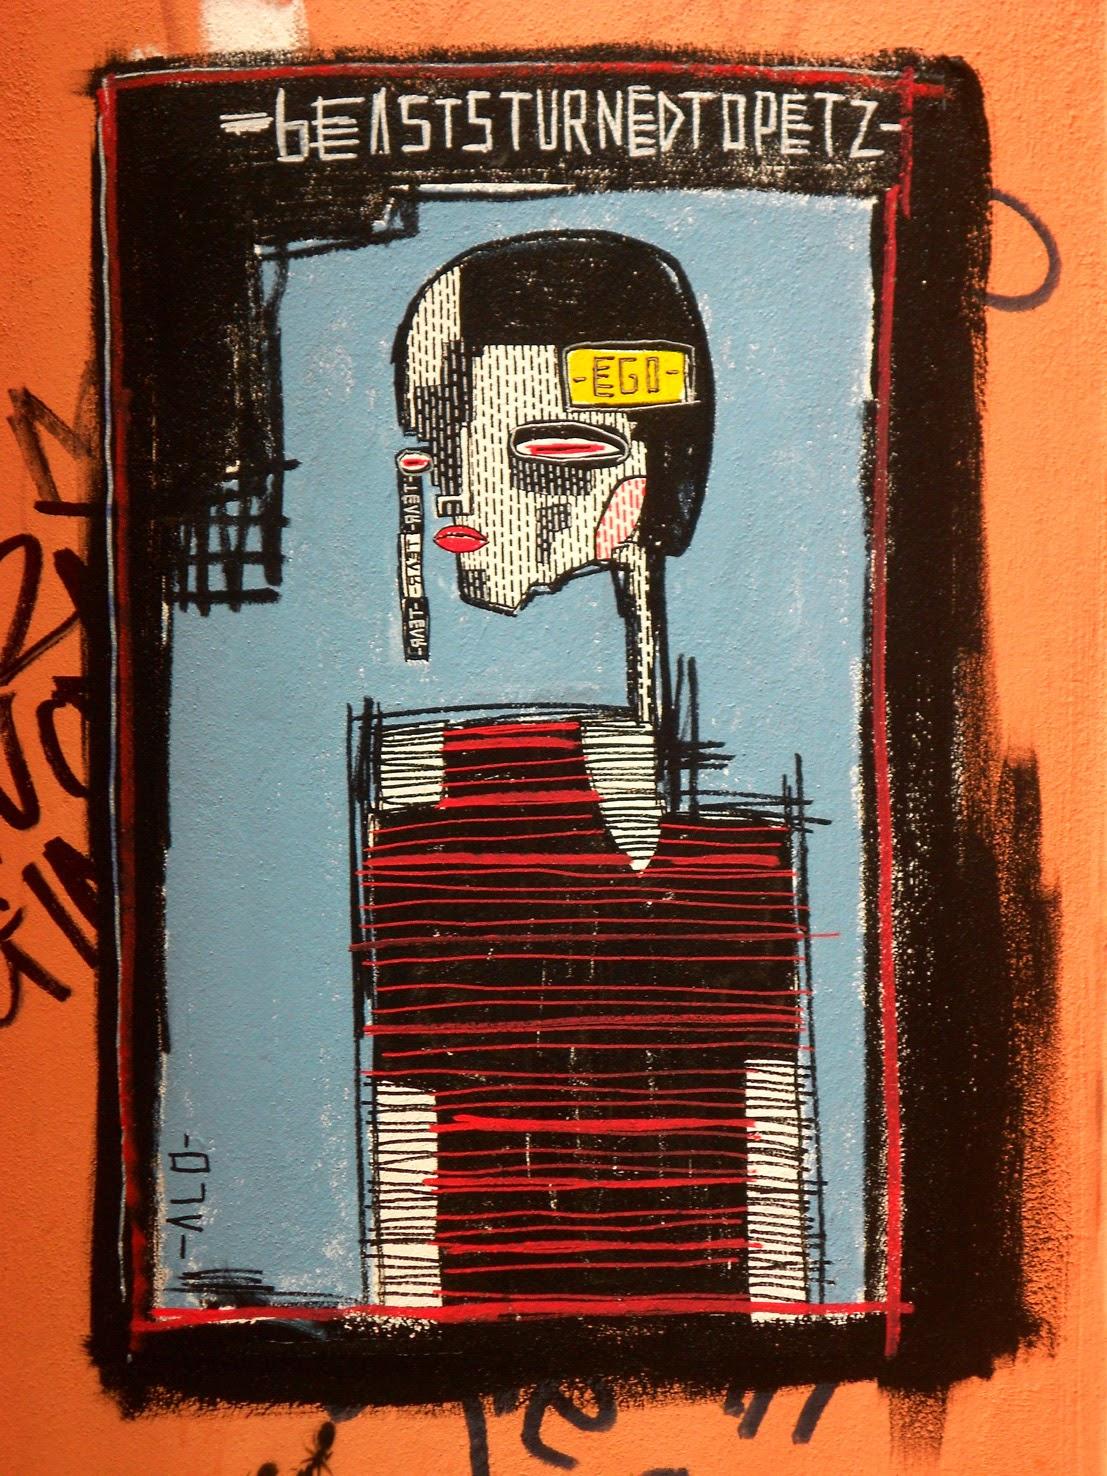 alo - aloart - painting - painter - graffiti - london - paris - artist - urban expressionism - urban art - street art - instaart